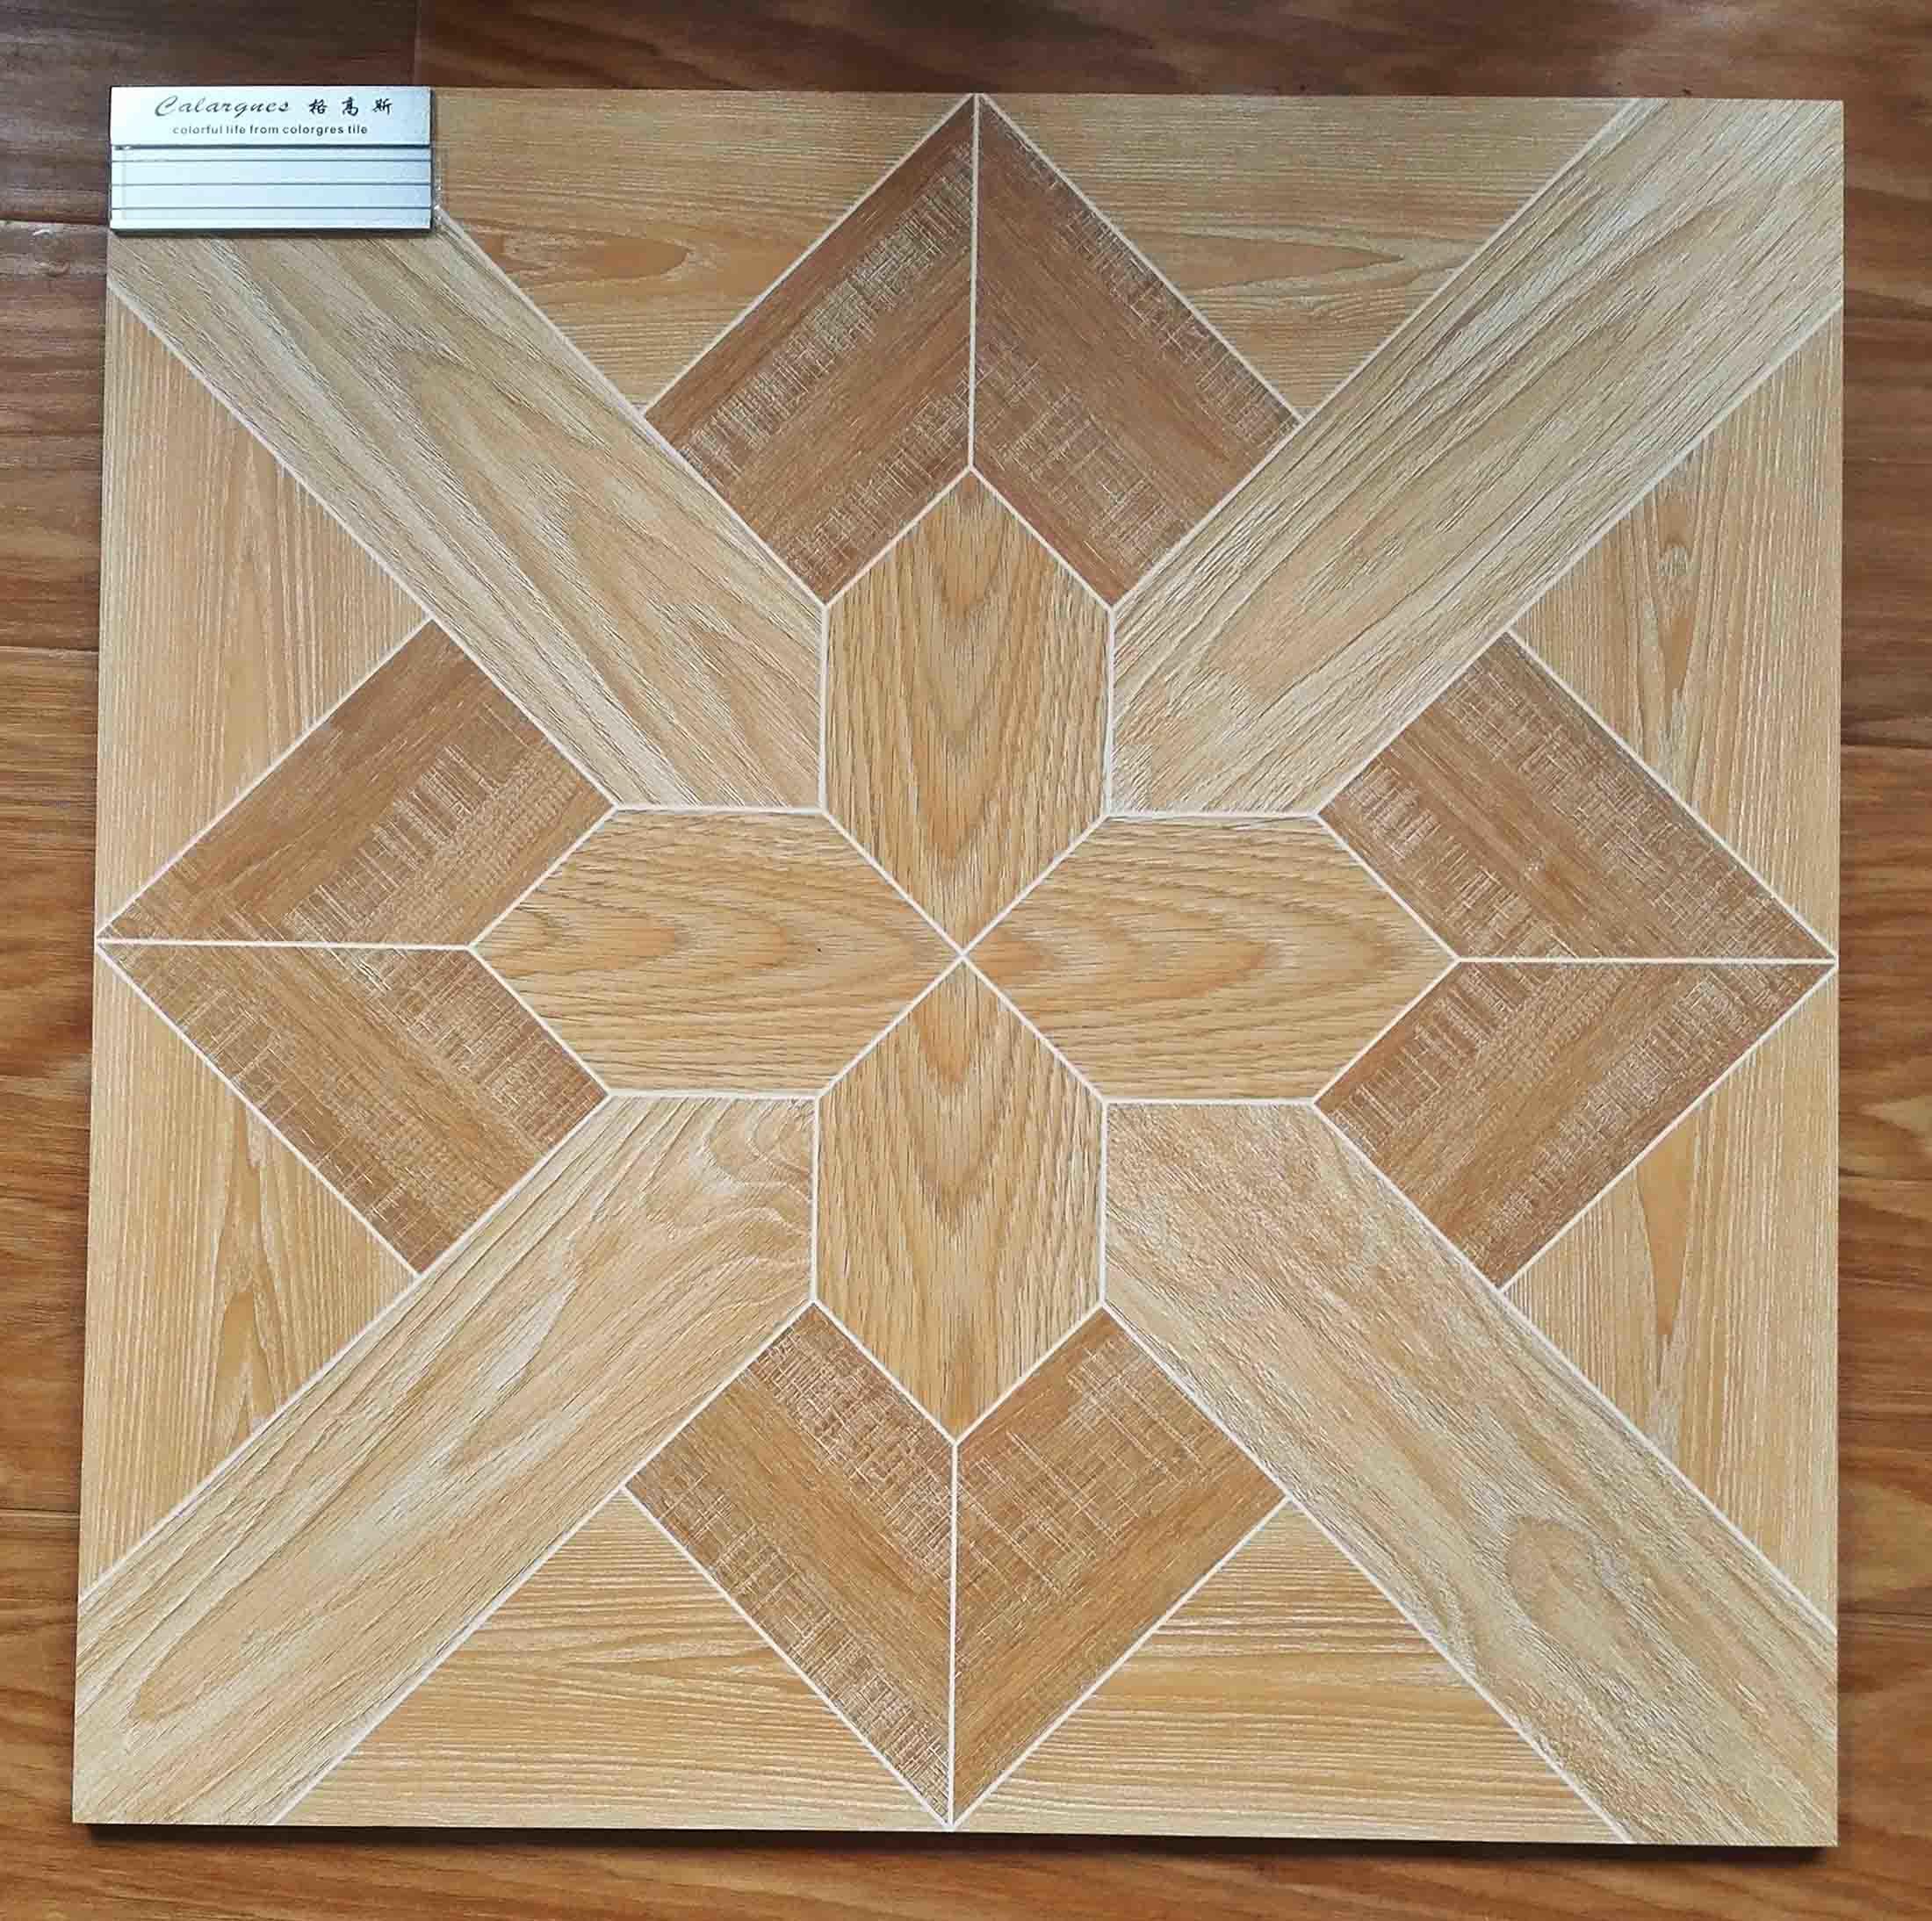 China 60 60cm Building Materials Rustic Floor Tile